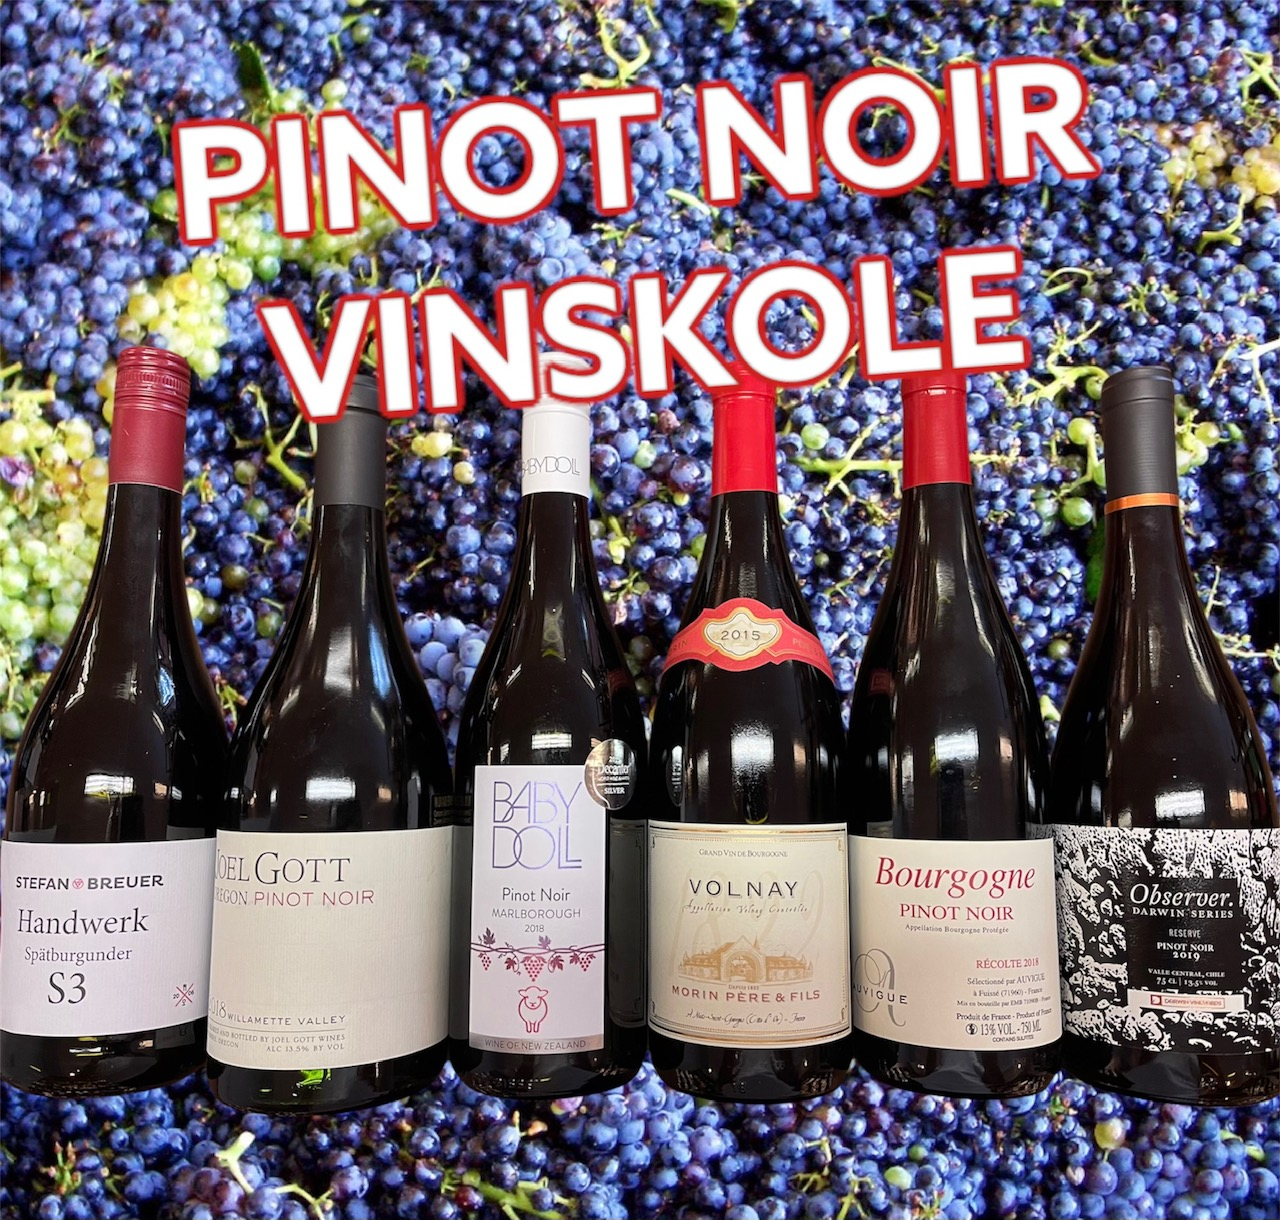 Pinot Noir Vinskole